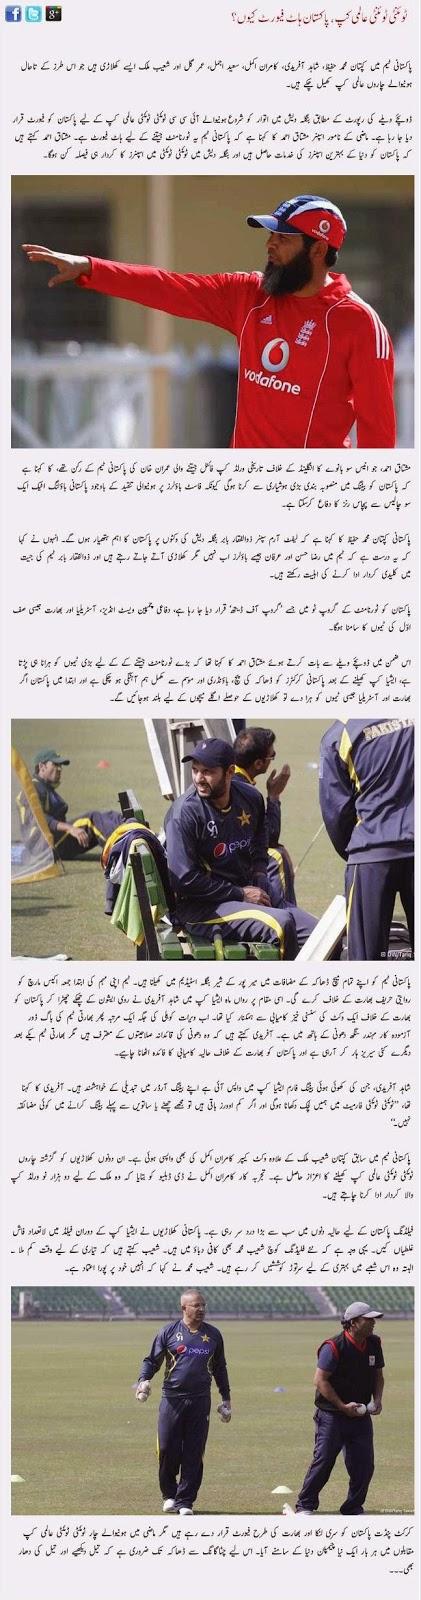 T20 World Cup, T20 World Cup 2014, T20 World Cup 2014 News, Pakisatn team, Analysis, Intresting Analysis,